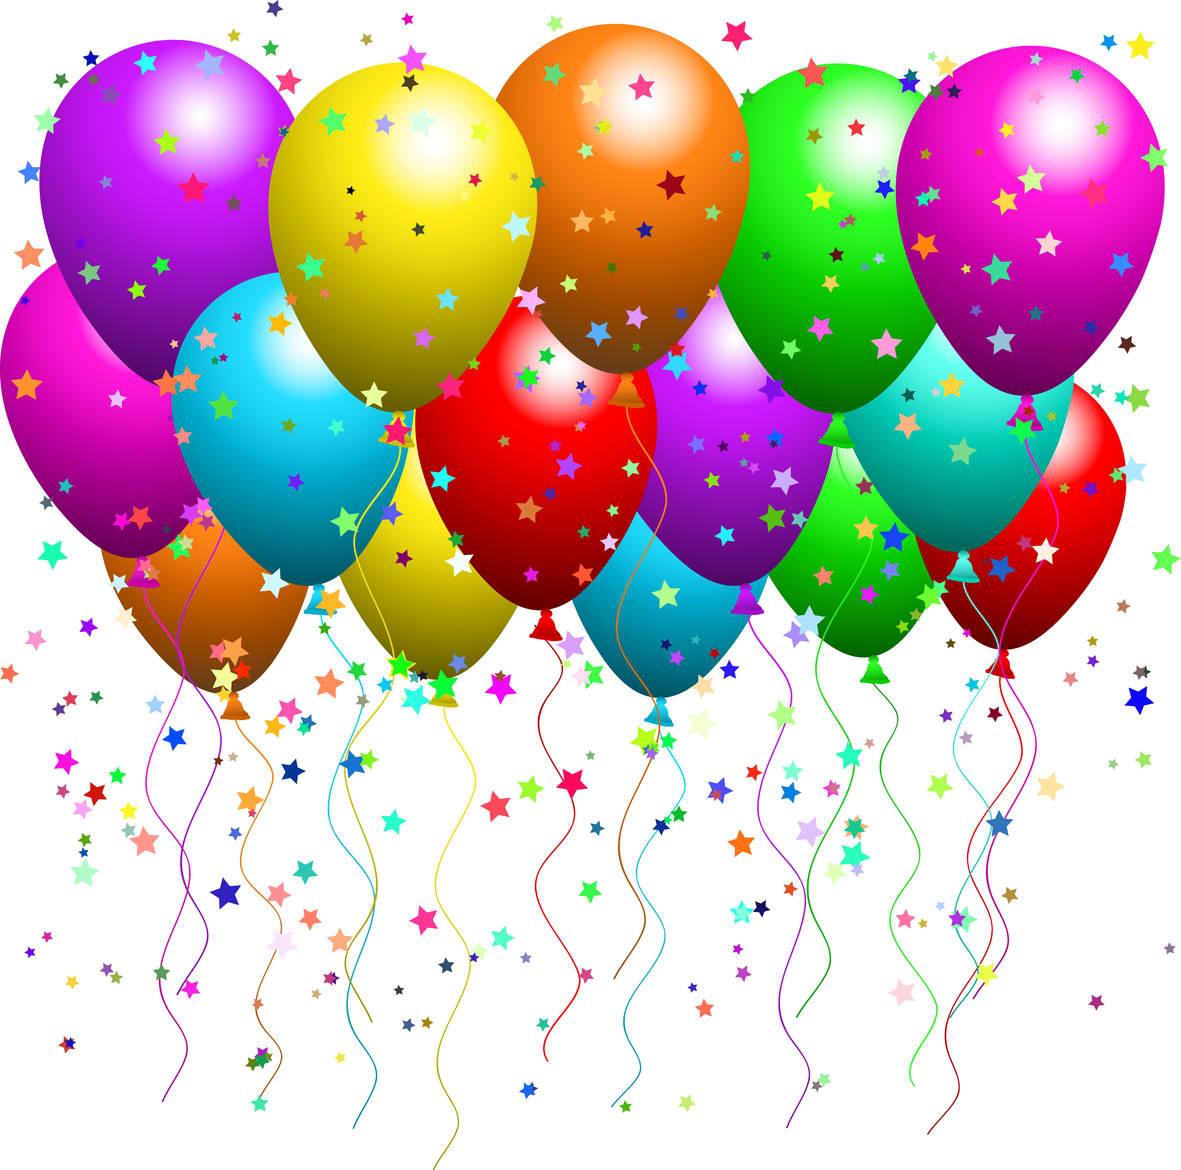 Birthday Balloons Free Birthday Clipart -Birthday balloons free birthday clipart balloons muuf-10